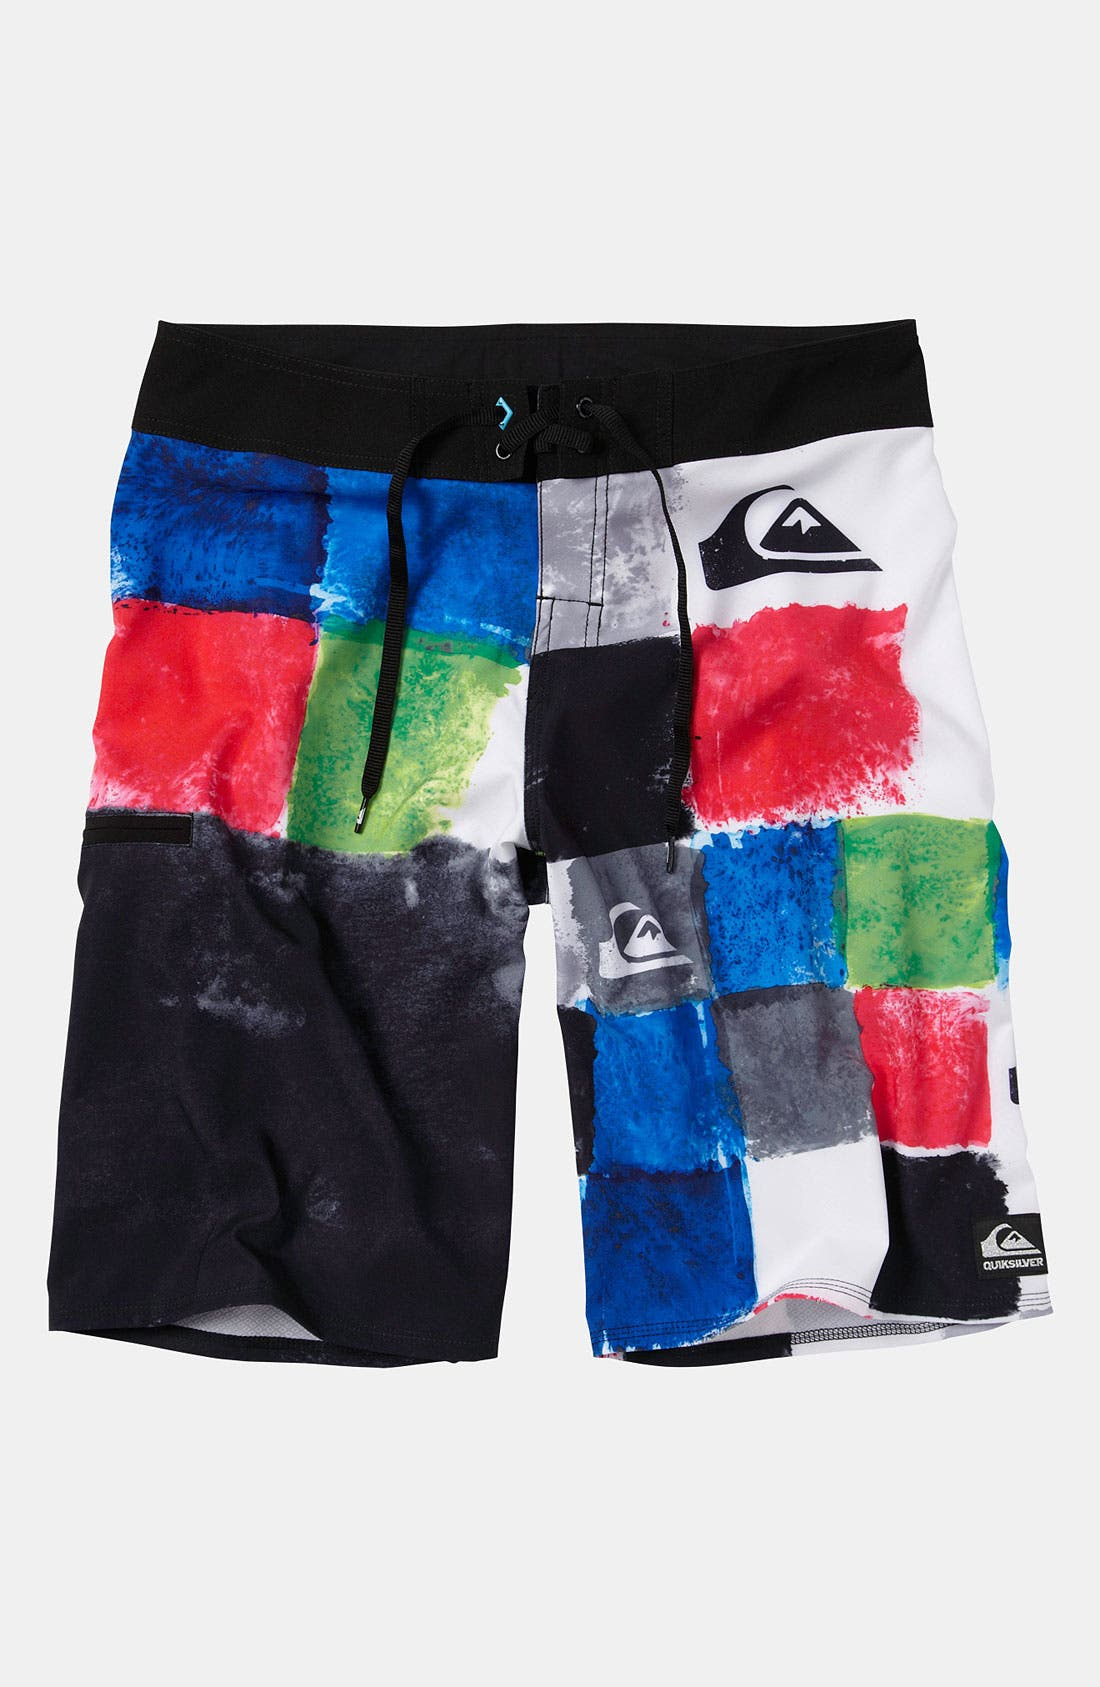 Alternate Image 1 Selected - Quiksilver 'Plasma' Board Shorts (Big Boys)